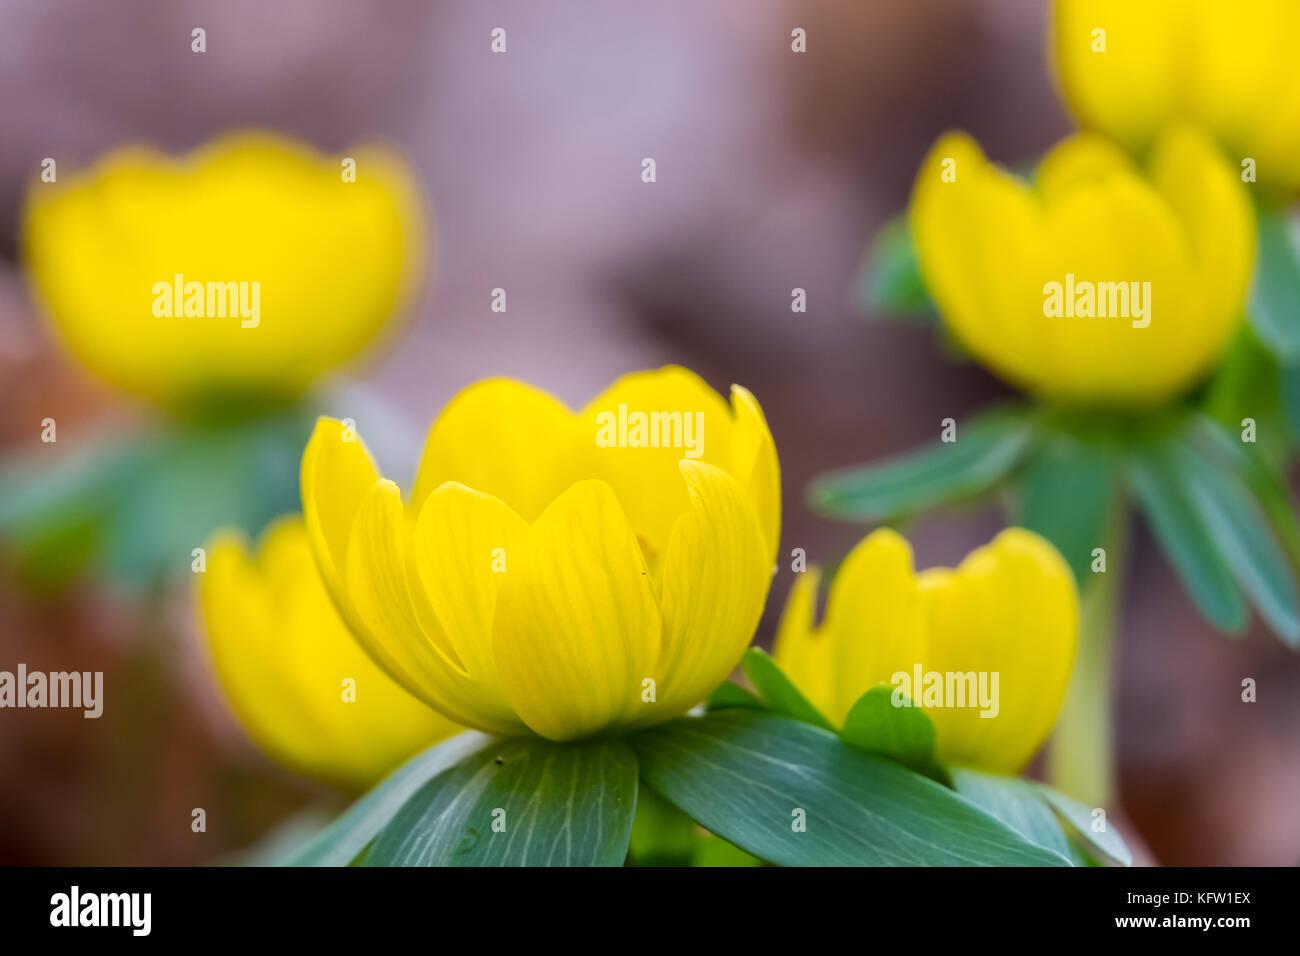 Frühblüher Winterlinge Stock Photo